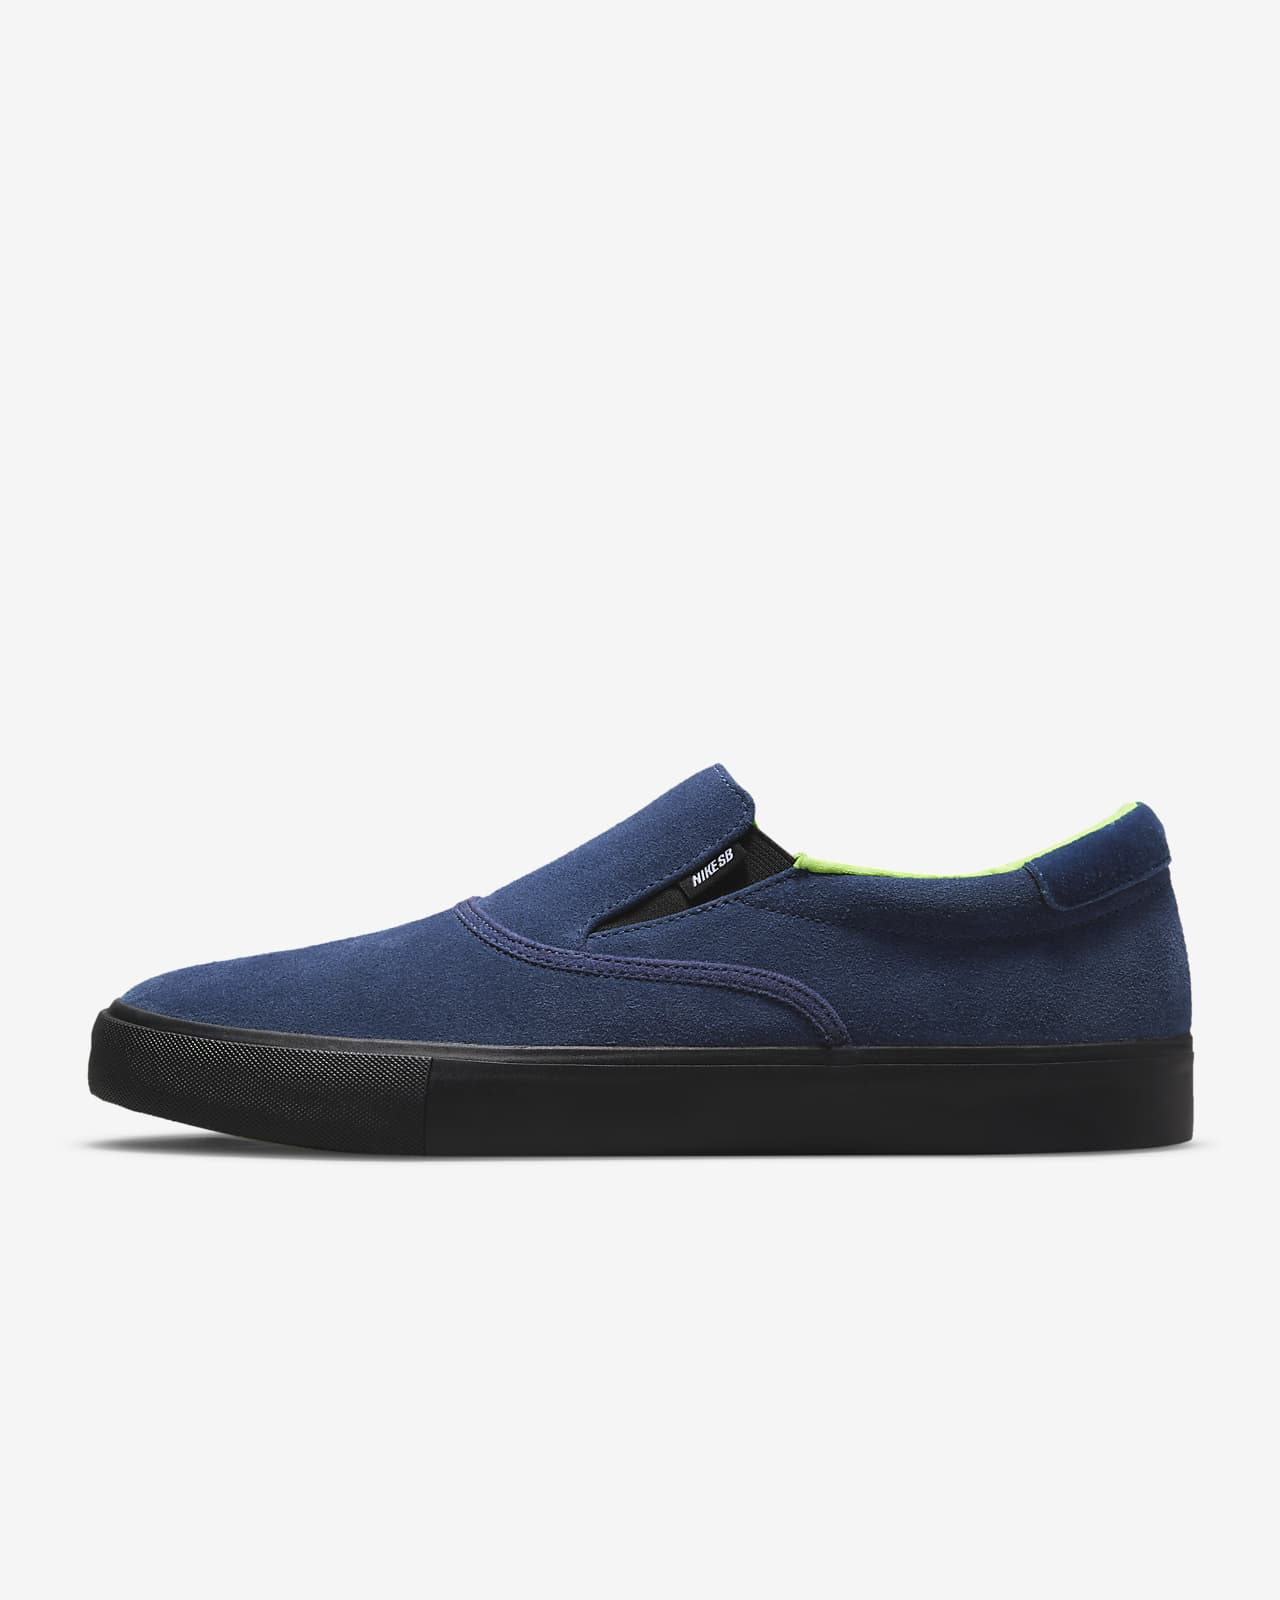 Chaussure de skateboard Nike SB Zoom Verona Slip x Leo Baker. Nike LU